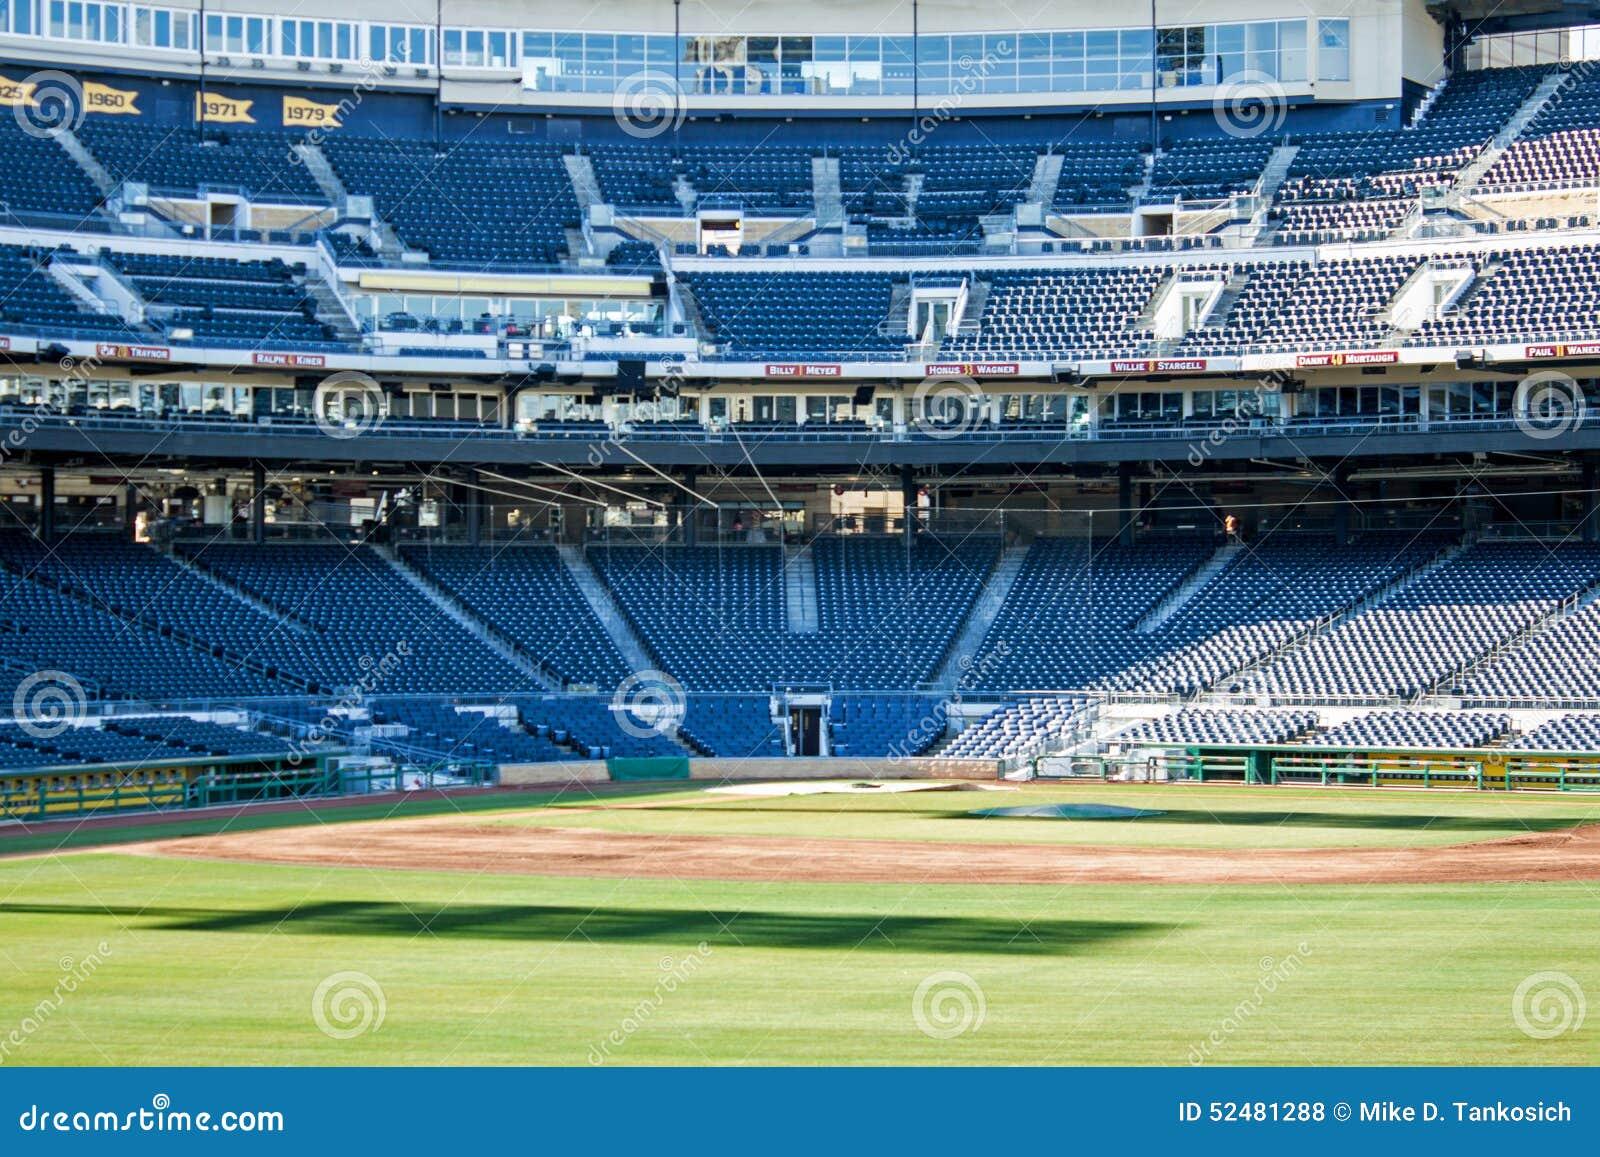 Baseball Blue Home Park Pittsburghs Plate Pnc